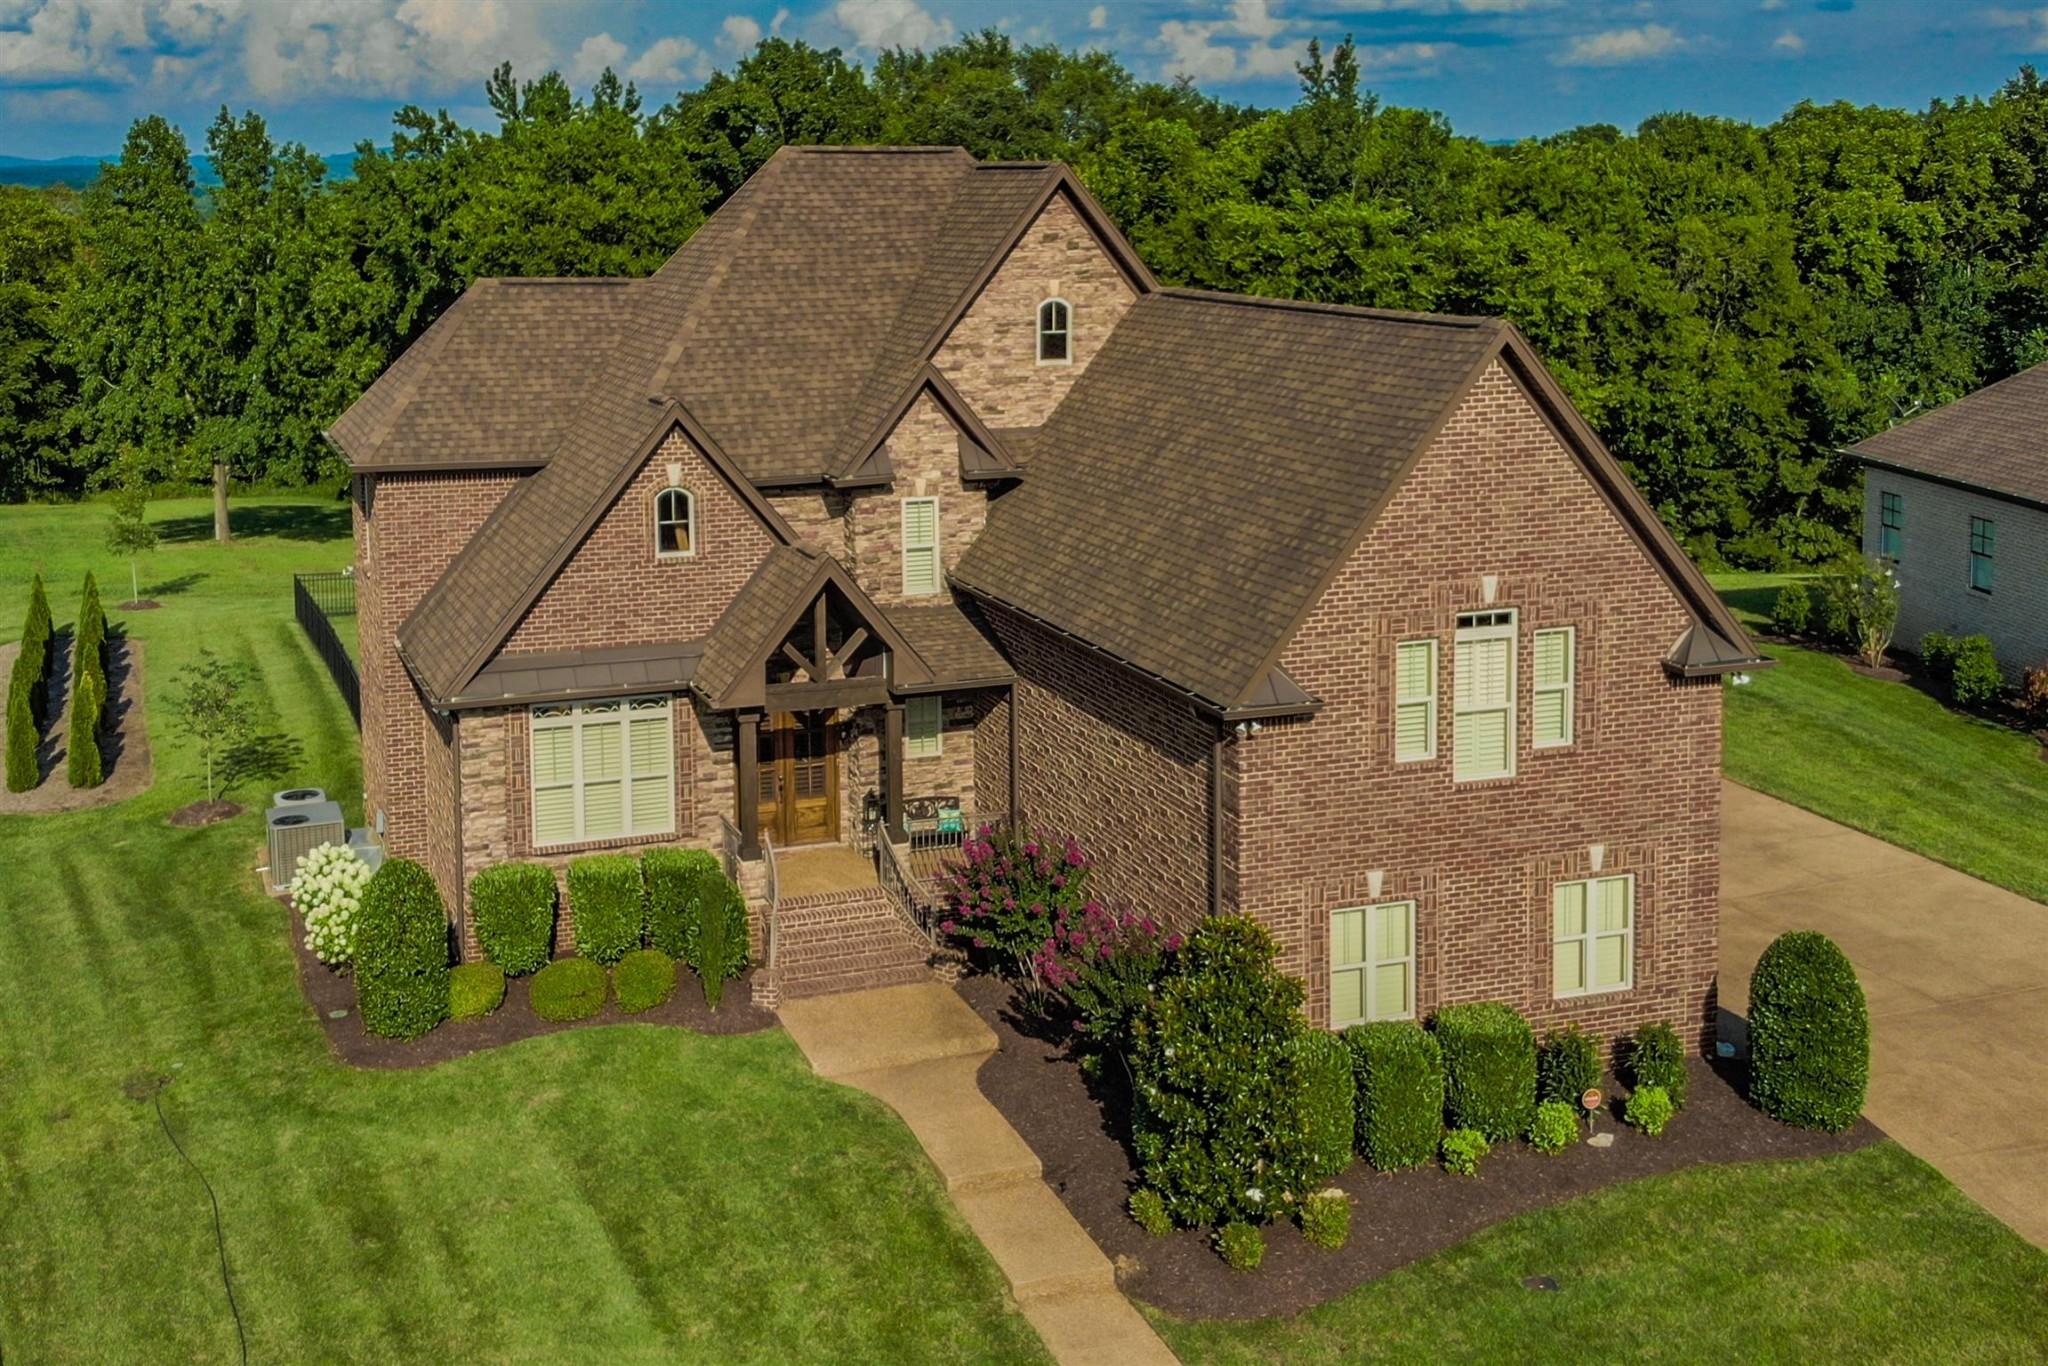 303 Charleston Street, Lebanon, TN 37087 - Lebanon, TN real estate listing